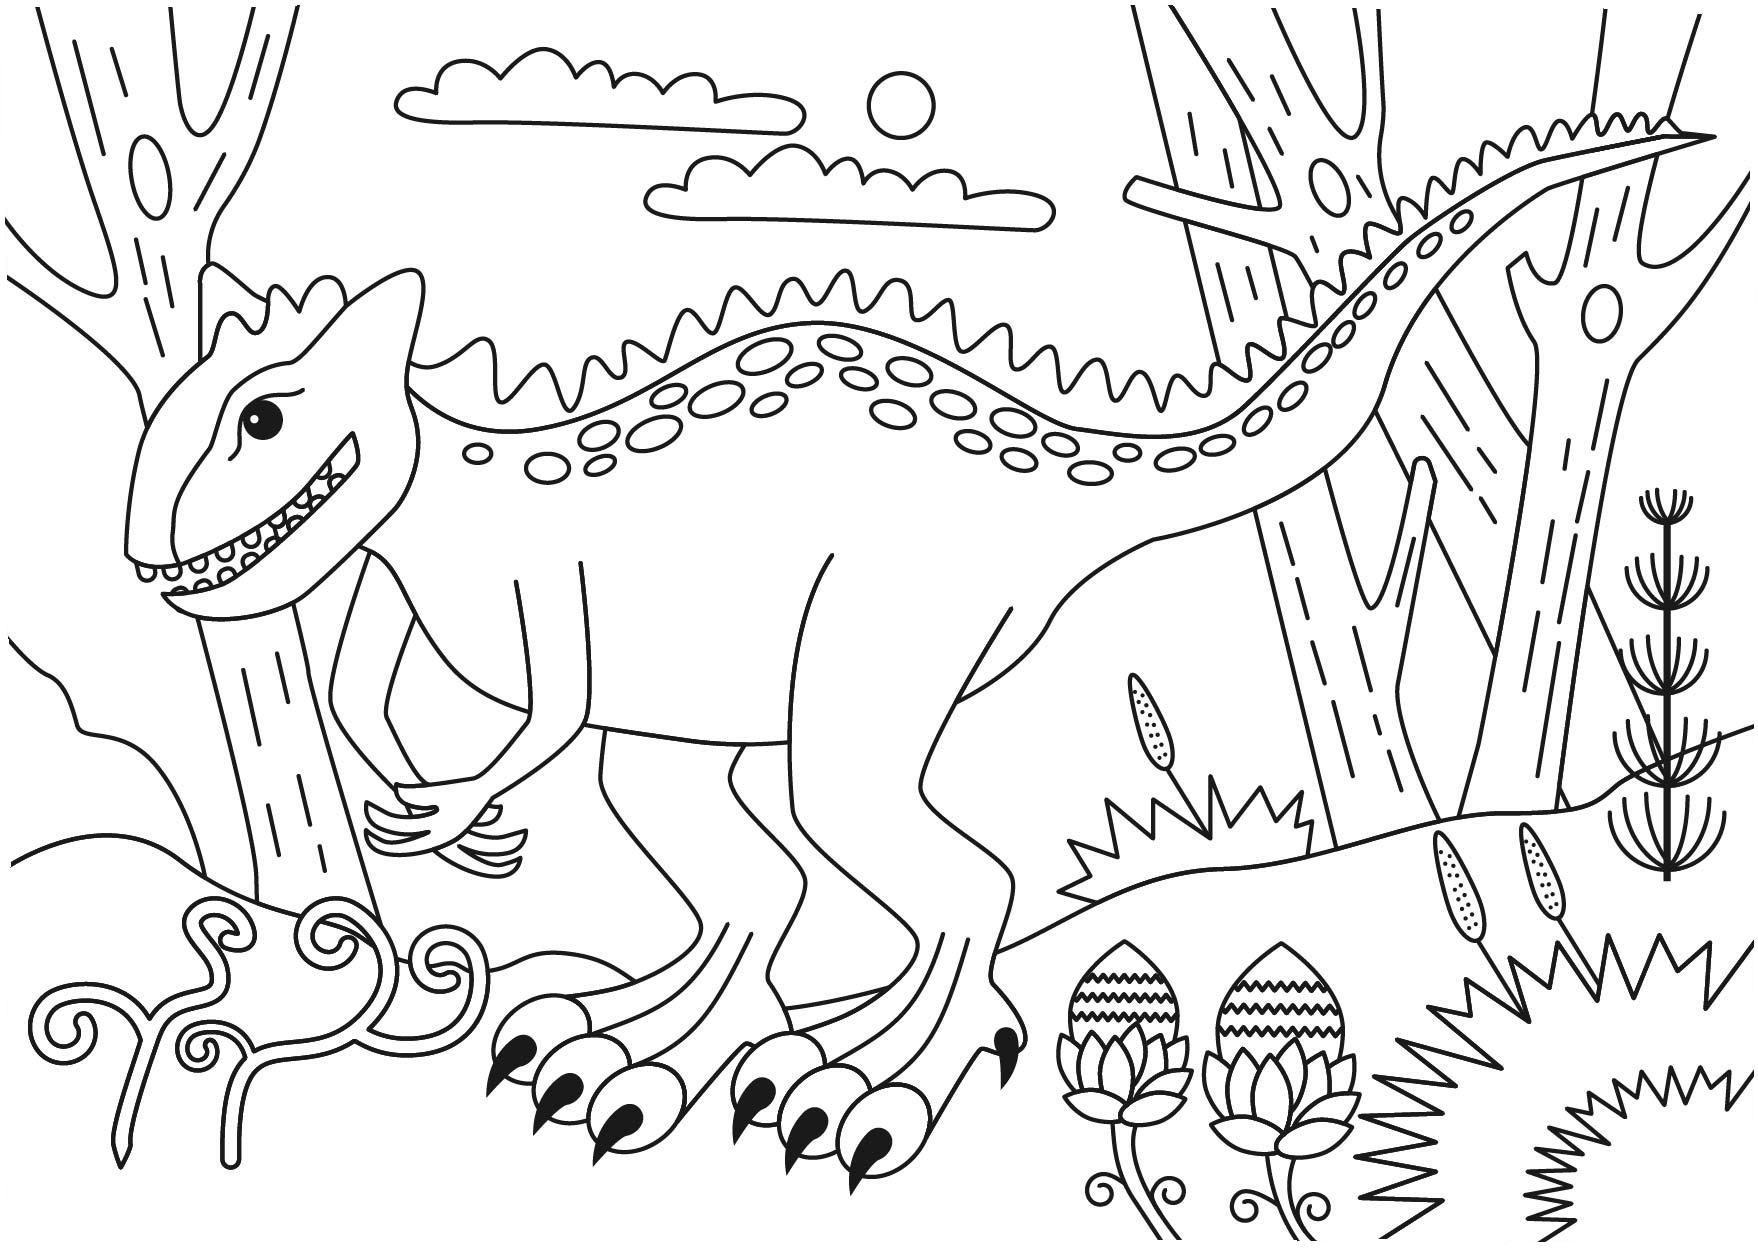 Carnotaurus, Carnotaurus dinosaur coloring pages,